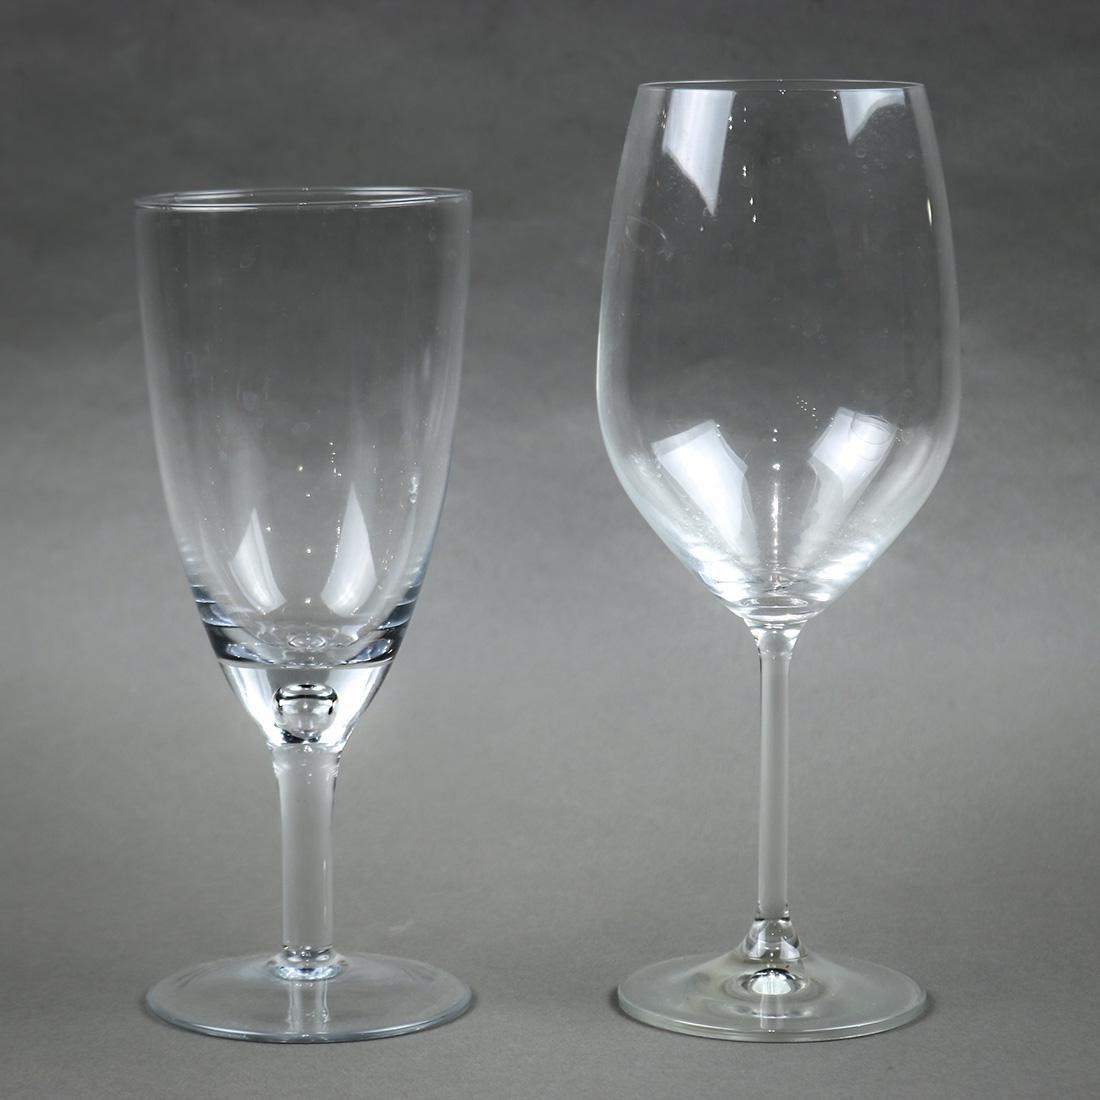 Lenox glass stemware